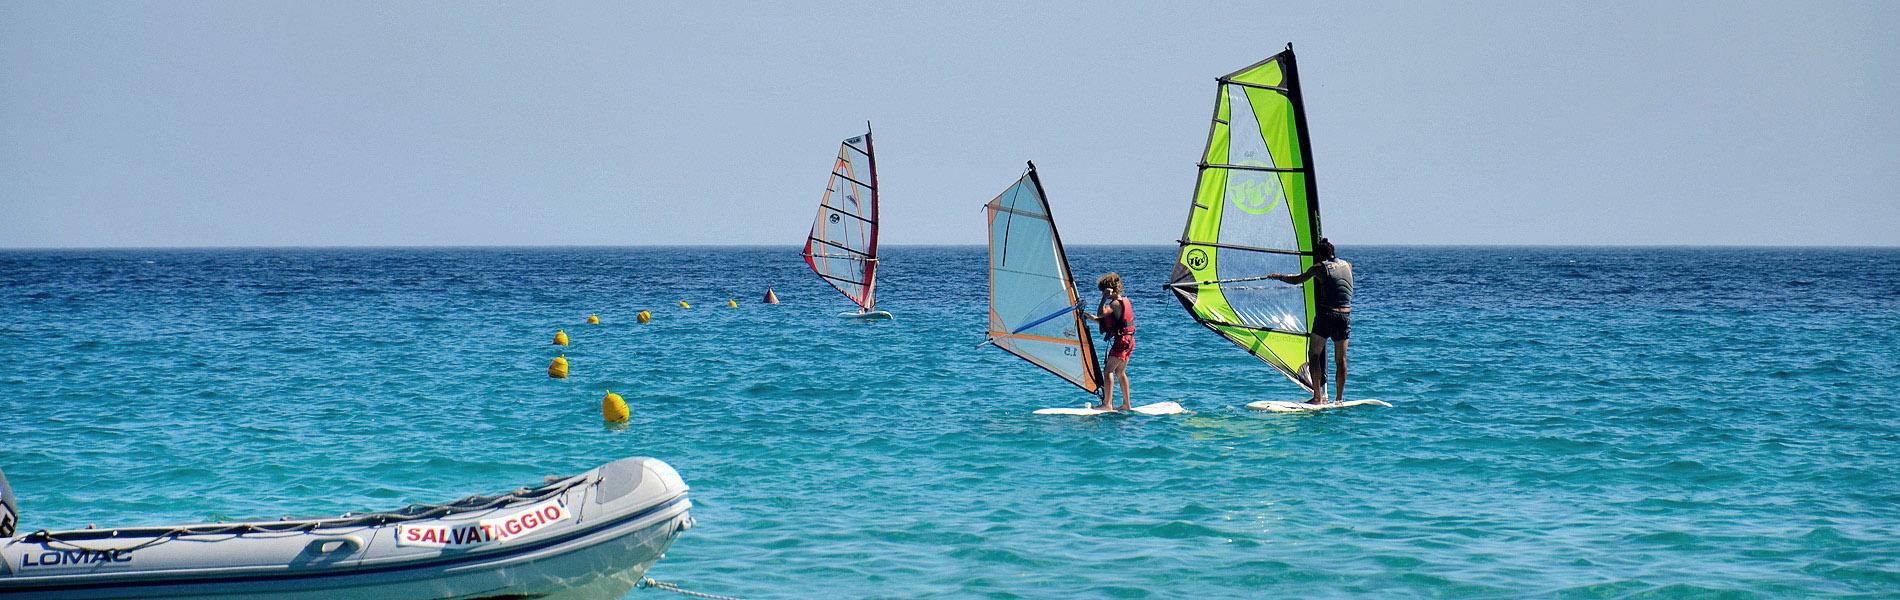 Nauticlub corso windsurf 02